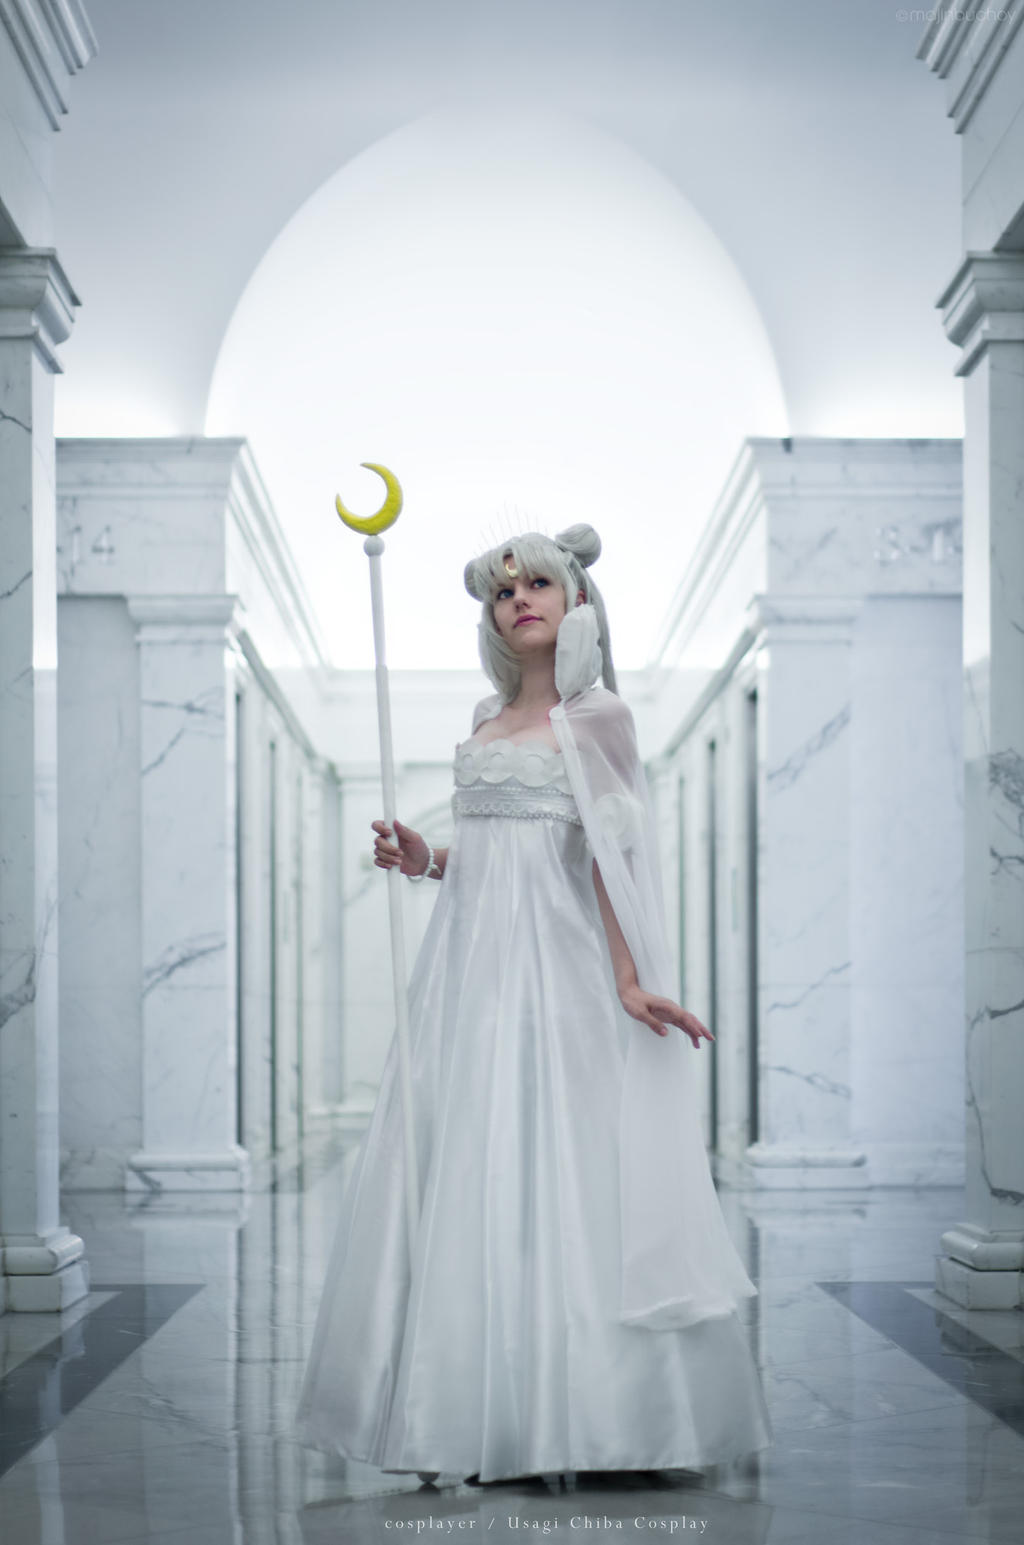 Princess Serenity 01 by MajinBuchoy